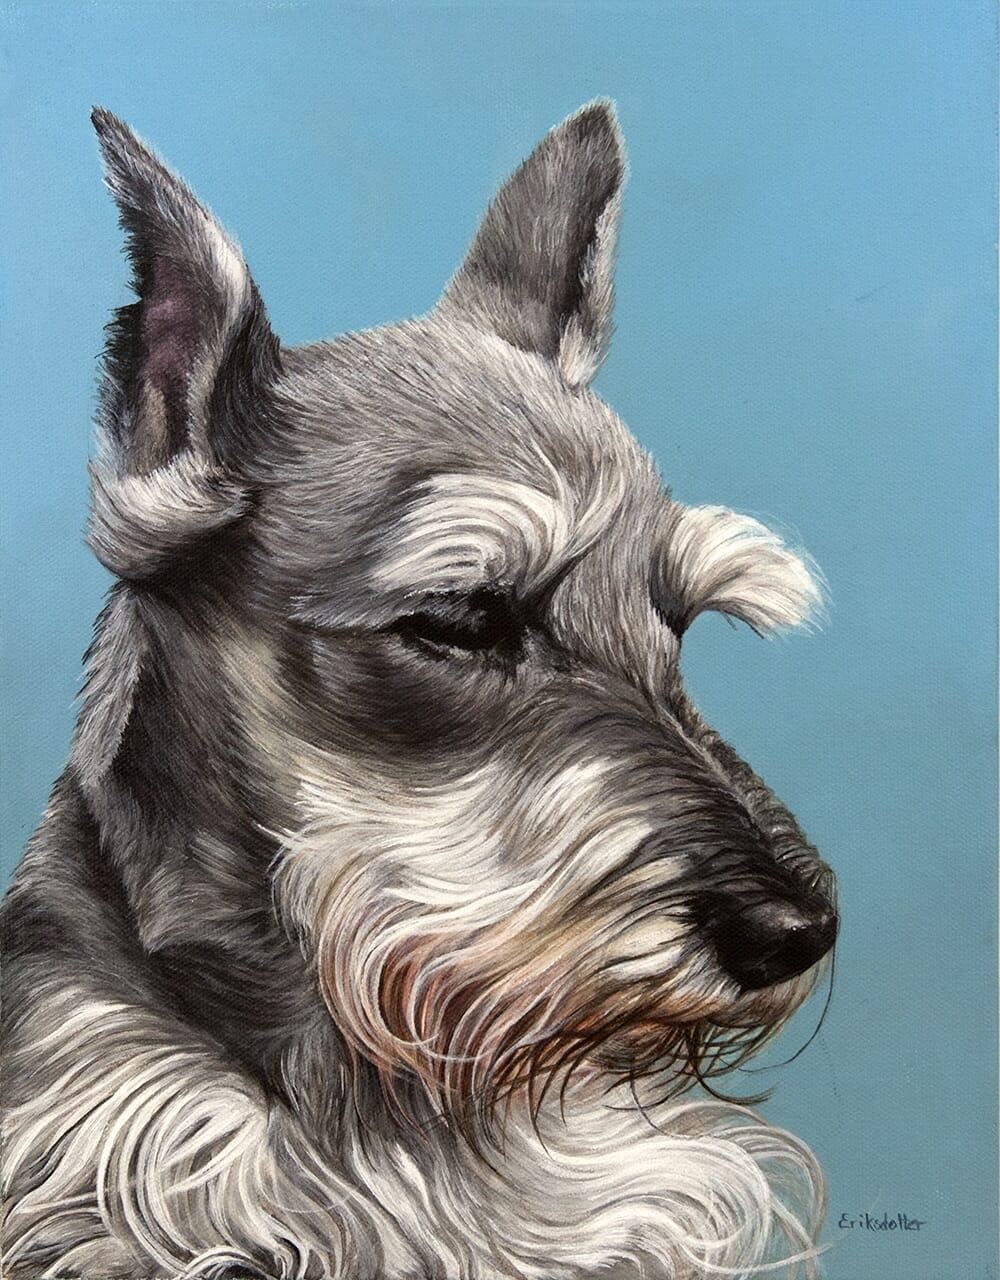 Custom dog portrait of a schnauzer dog by fine arts painter Erica Eriksdotter